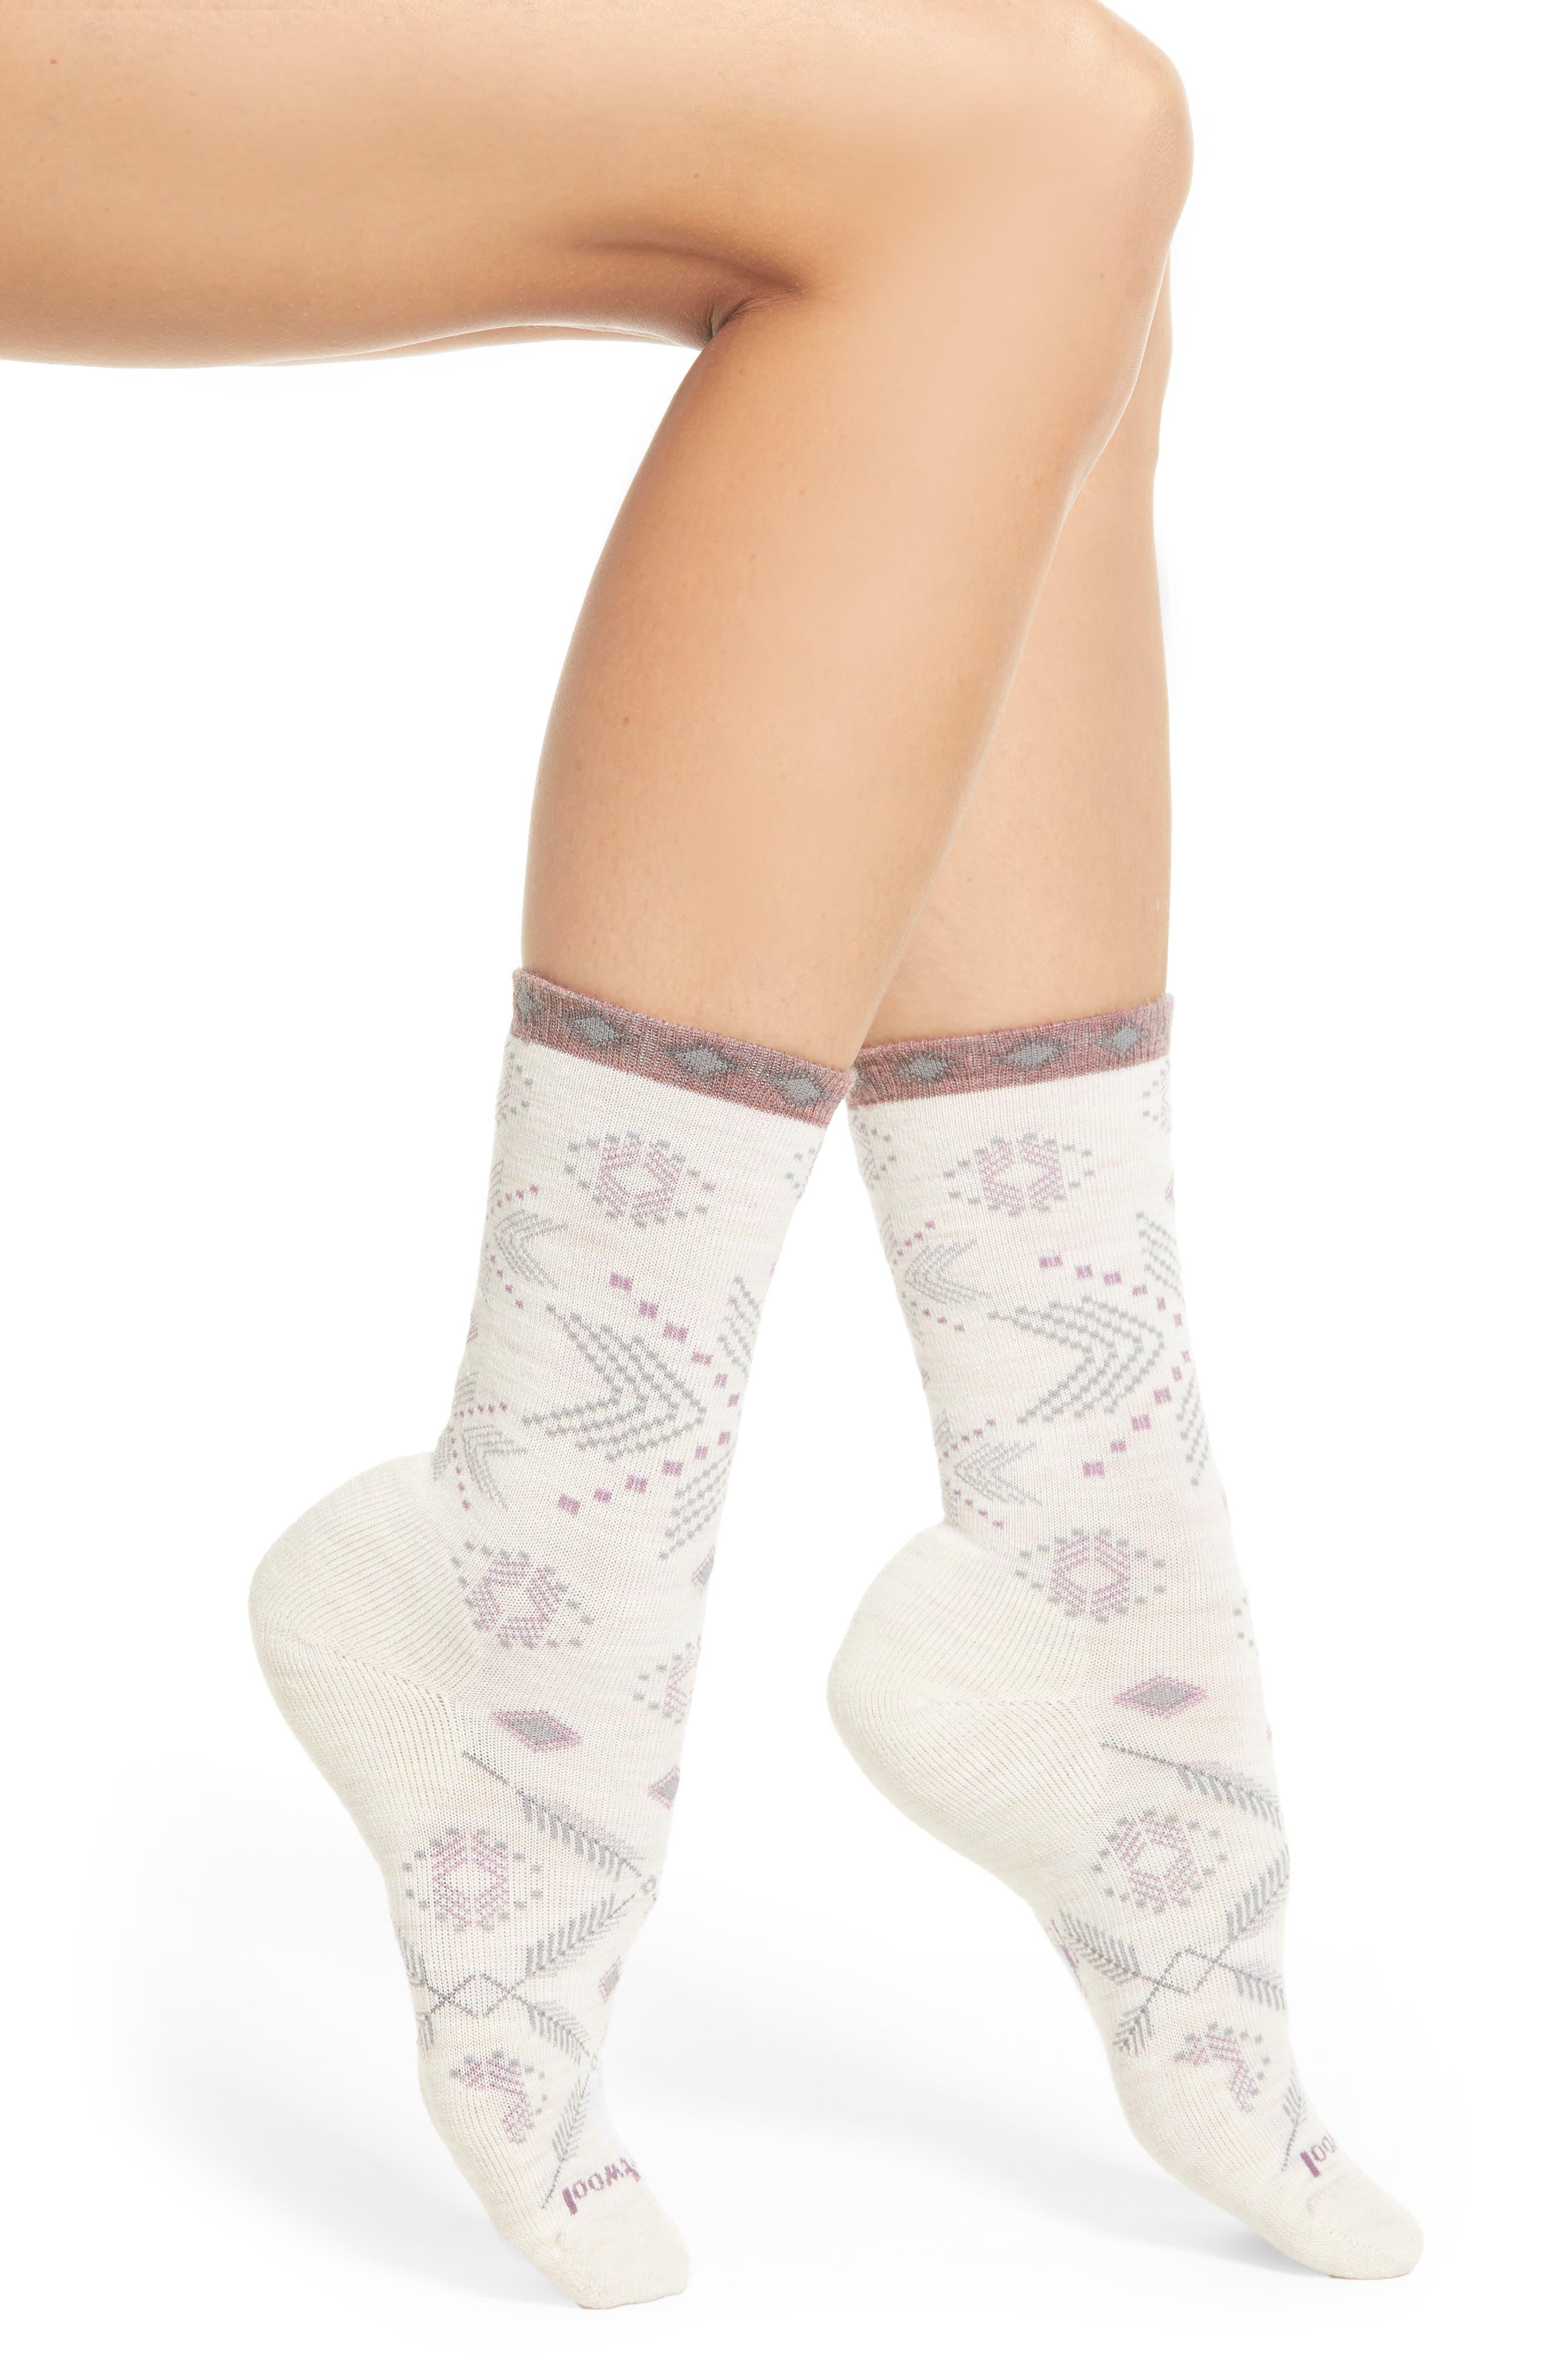 Dasher Crew Socks,                         Main,                         color, MOONBEAM HEATHER